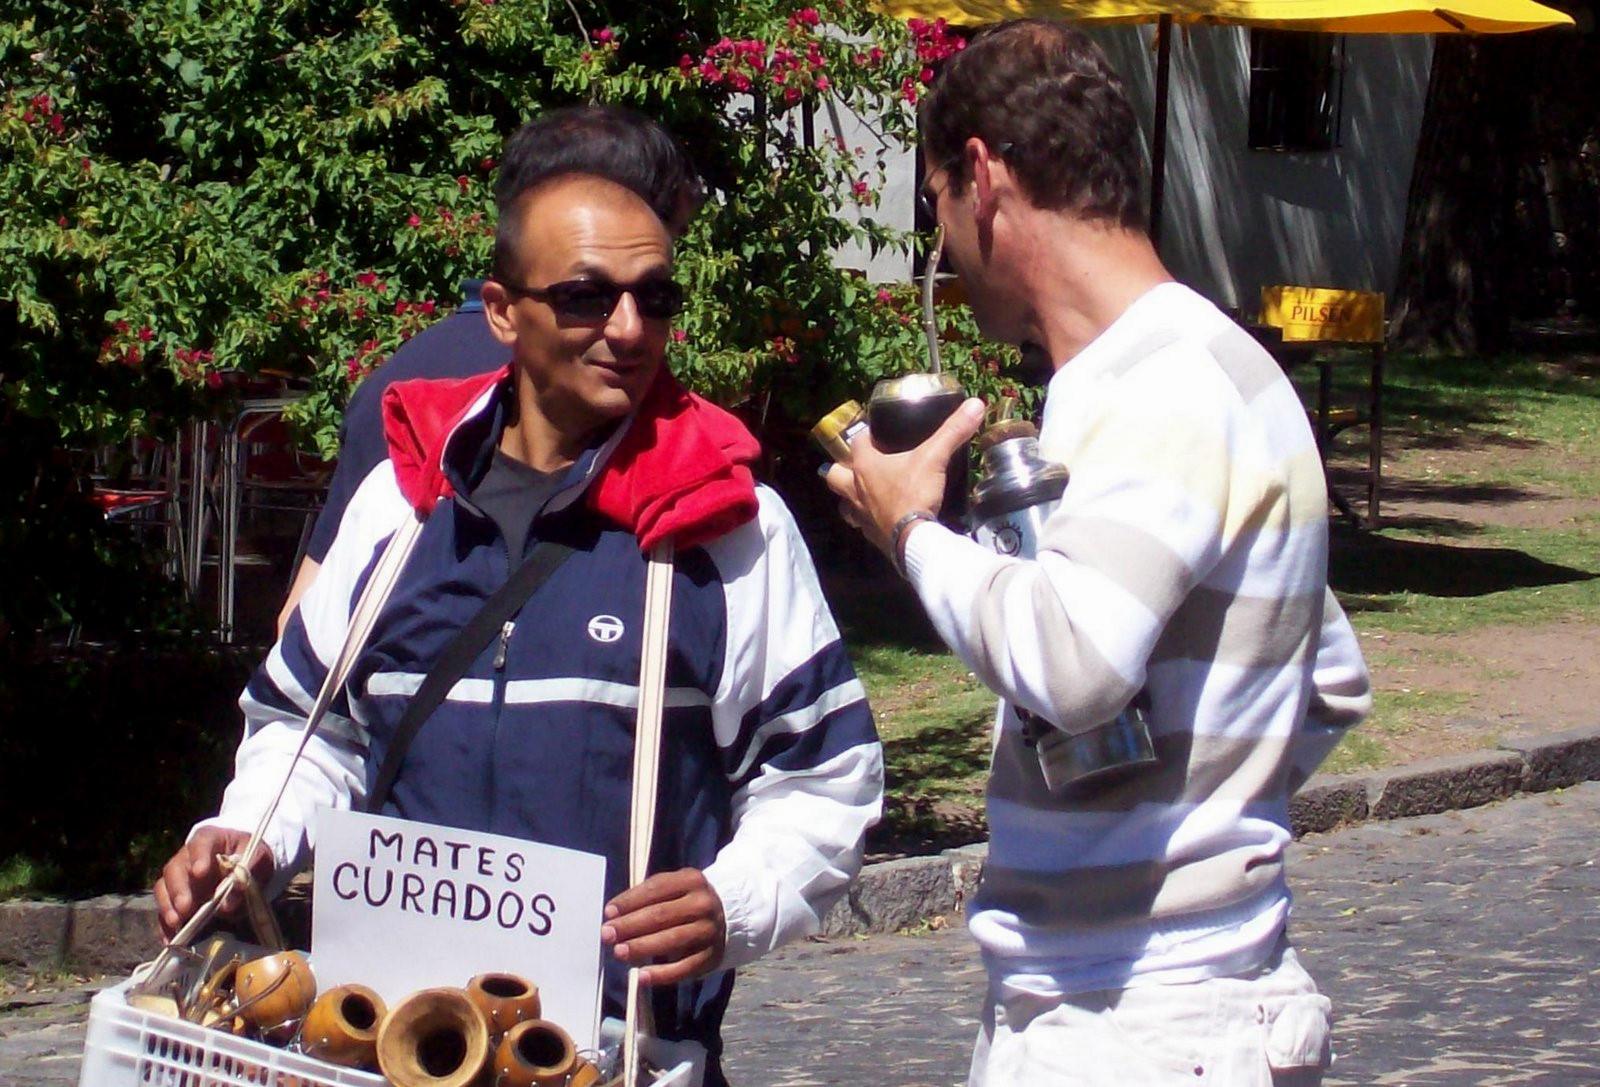 Verkäufer von Matetee in Uruguay